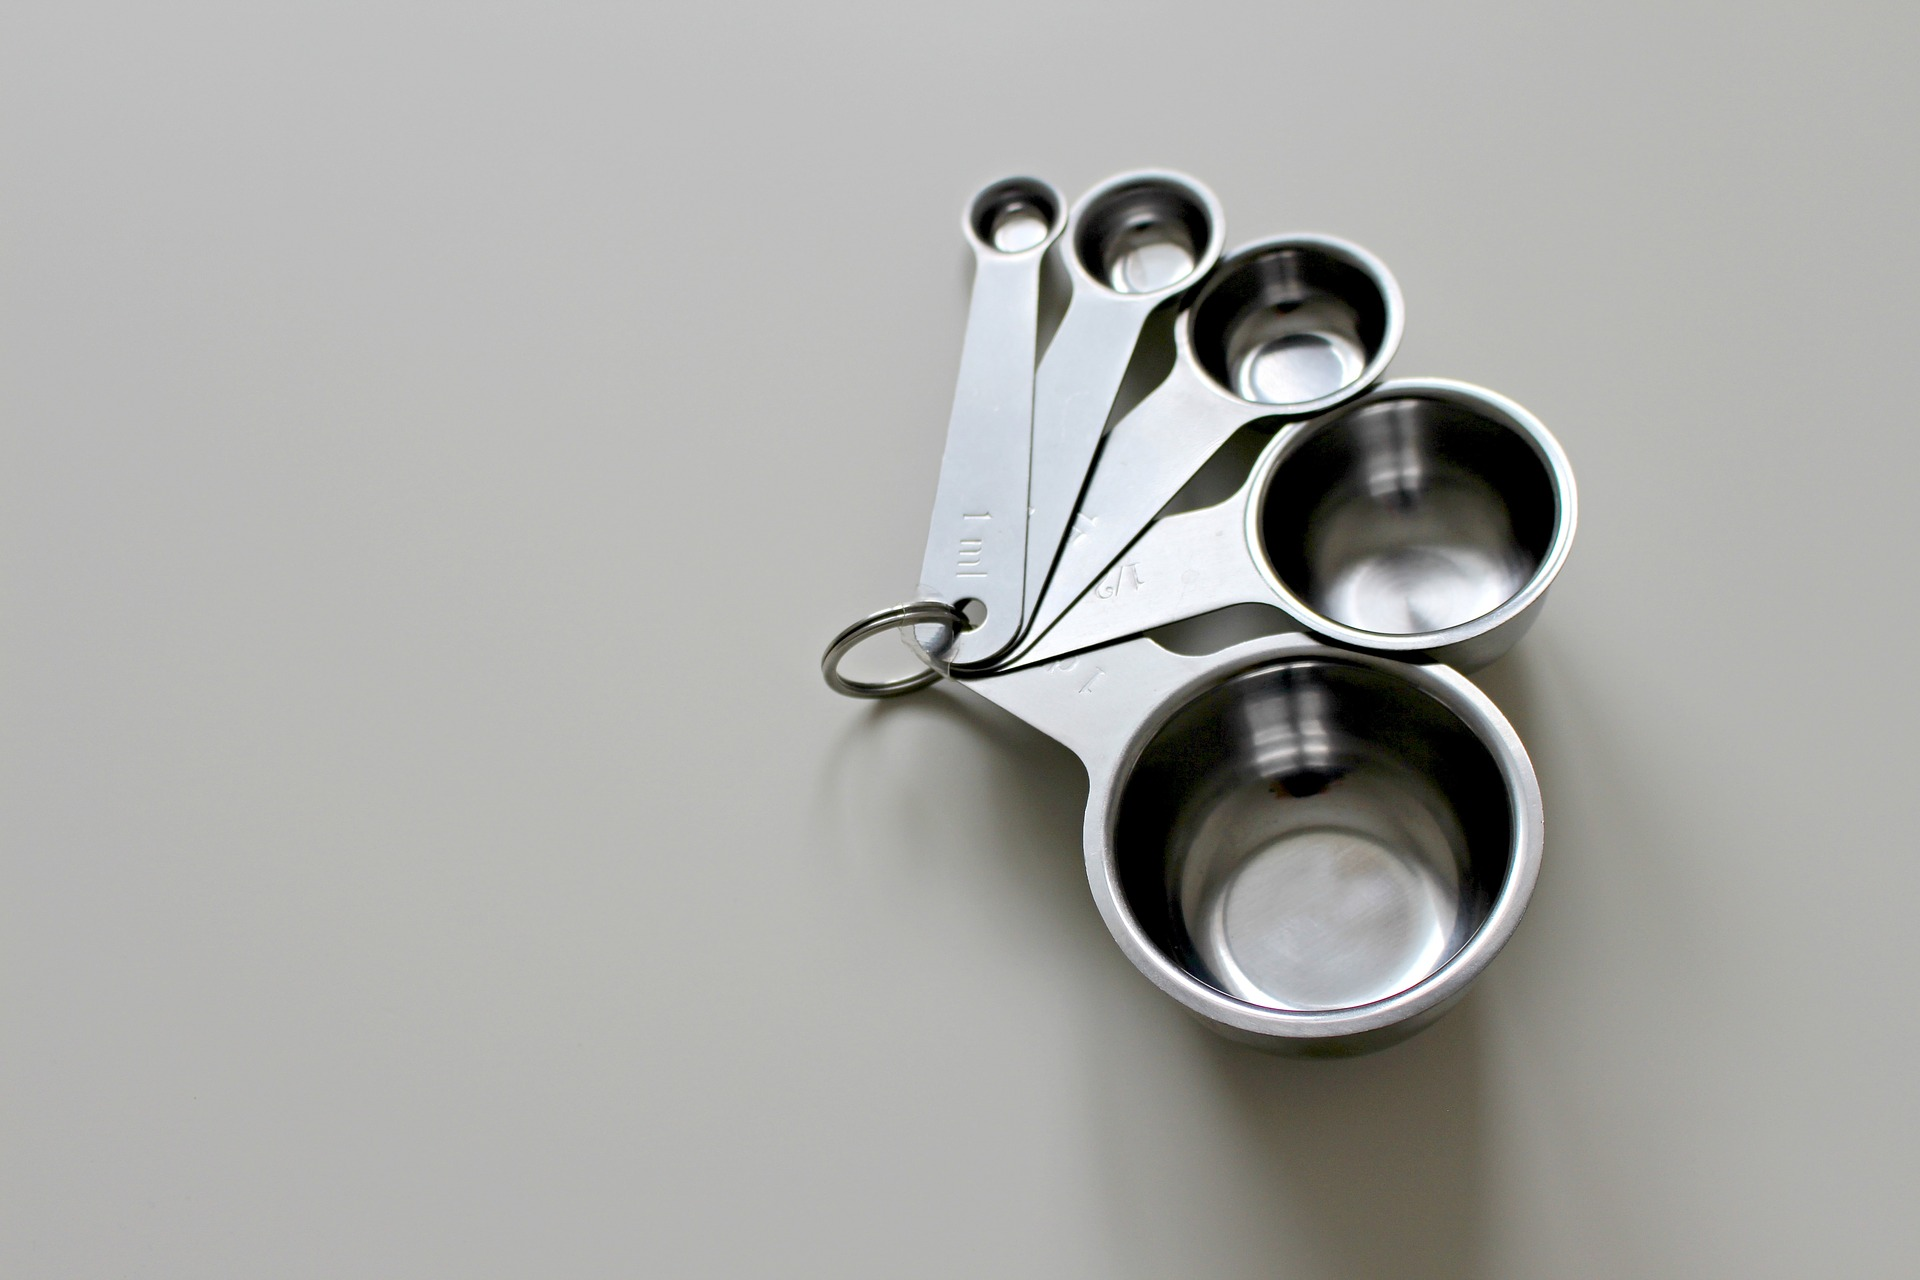 measuring-cup-2510243_1920 (1)